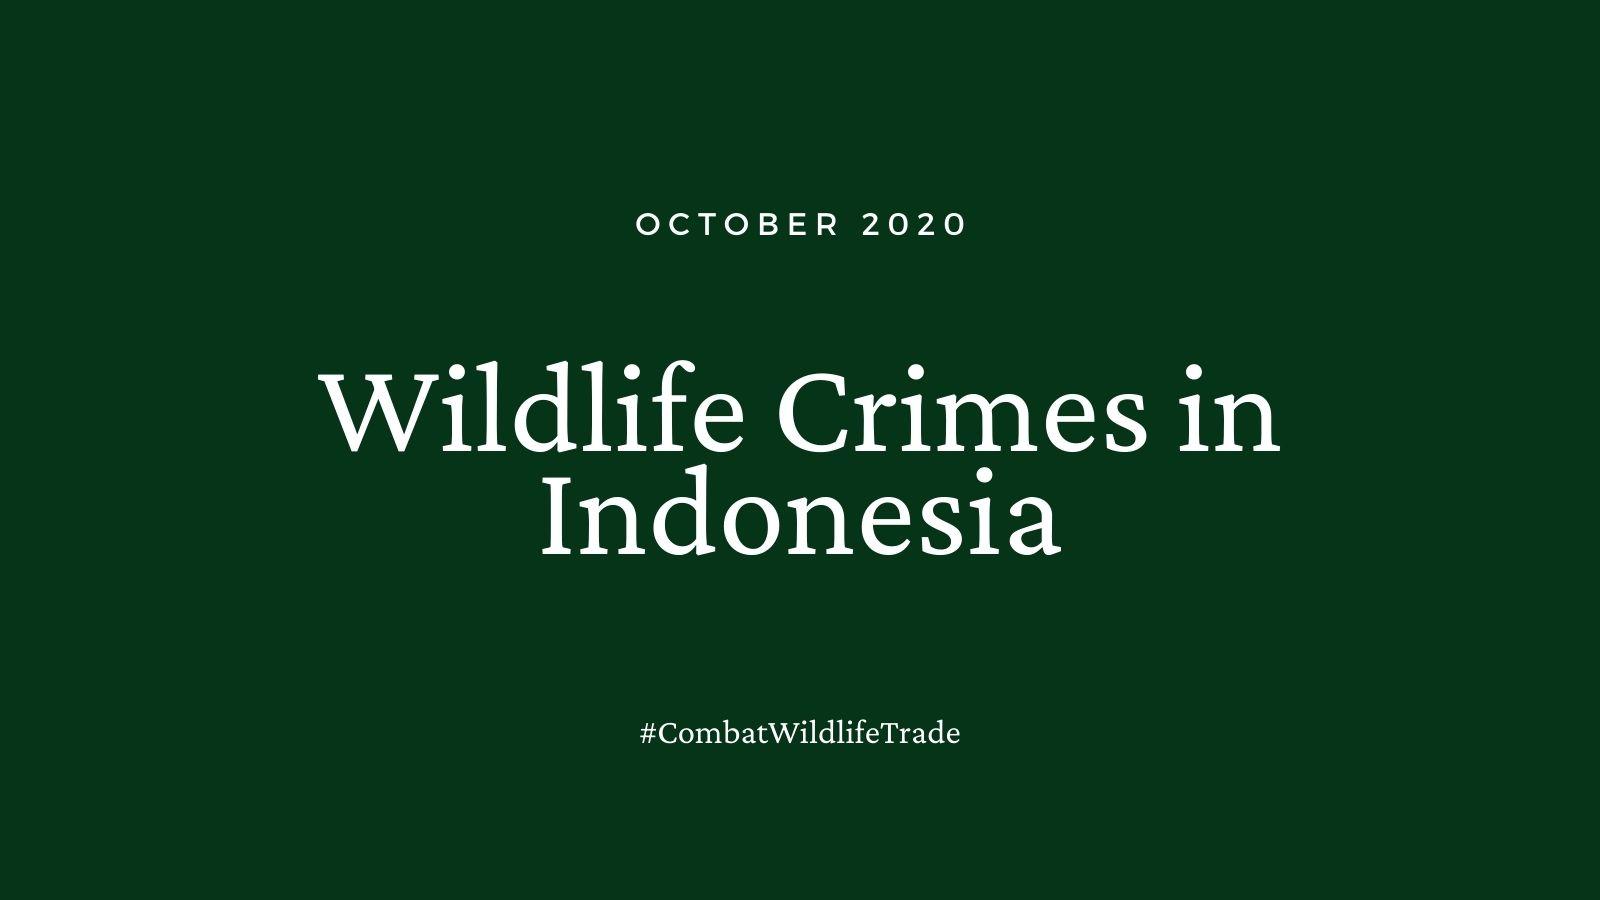 WIldlife Crimes in Indonesia, October 2020